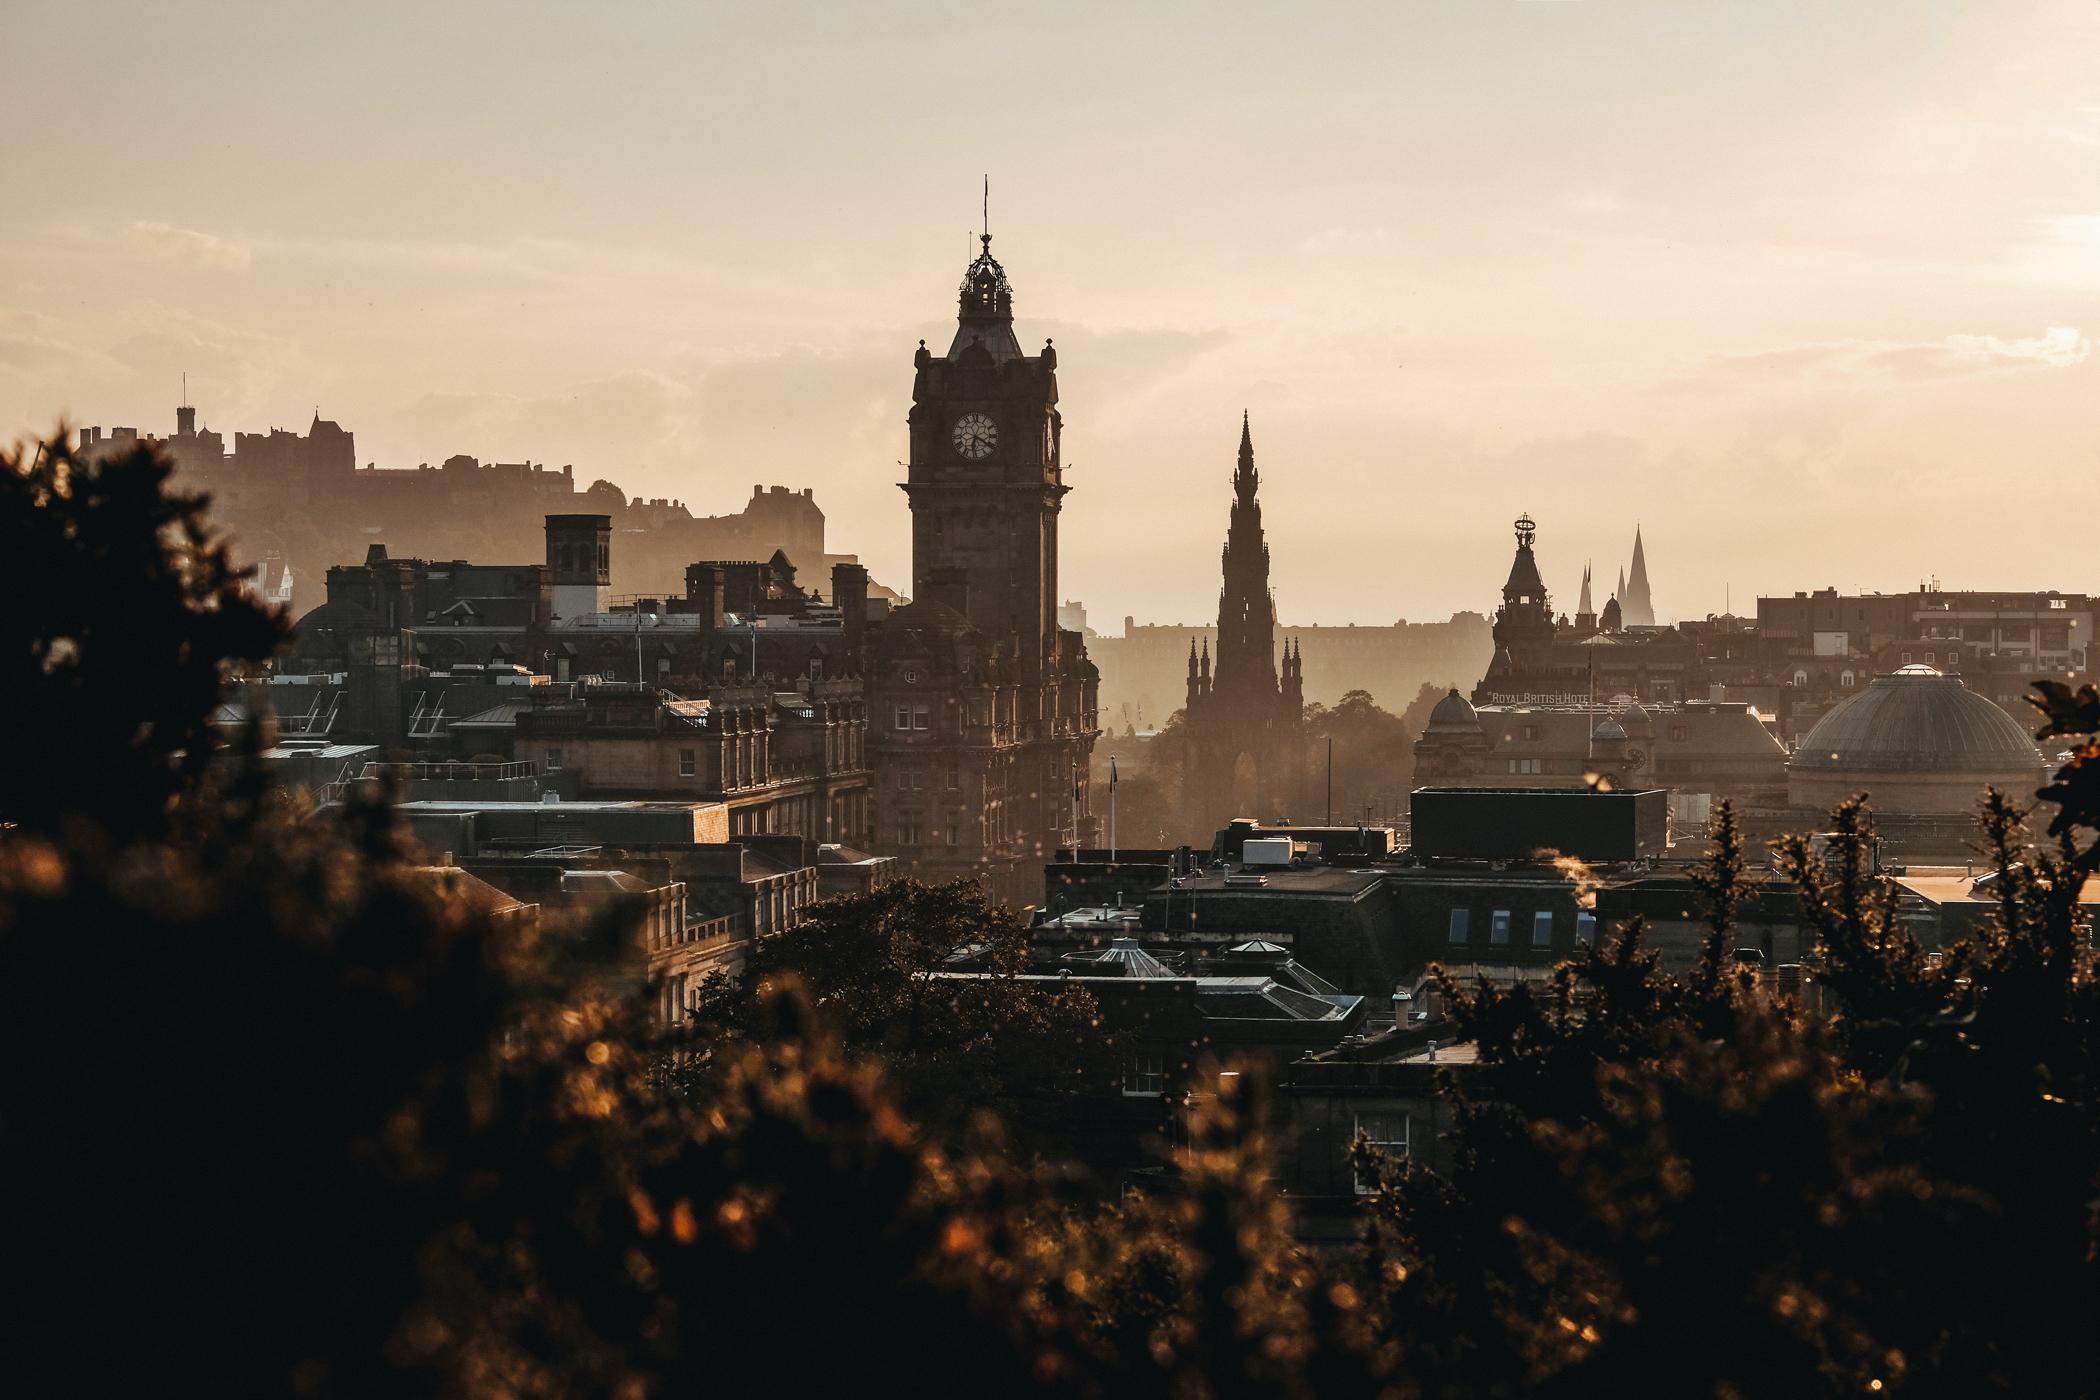 image of Edinburgh